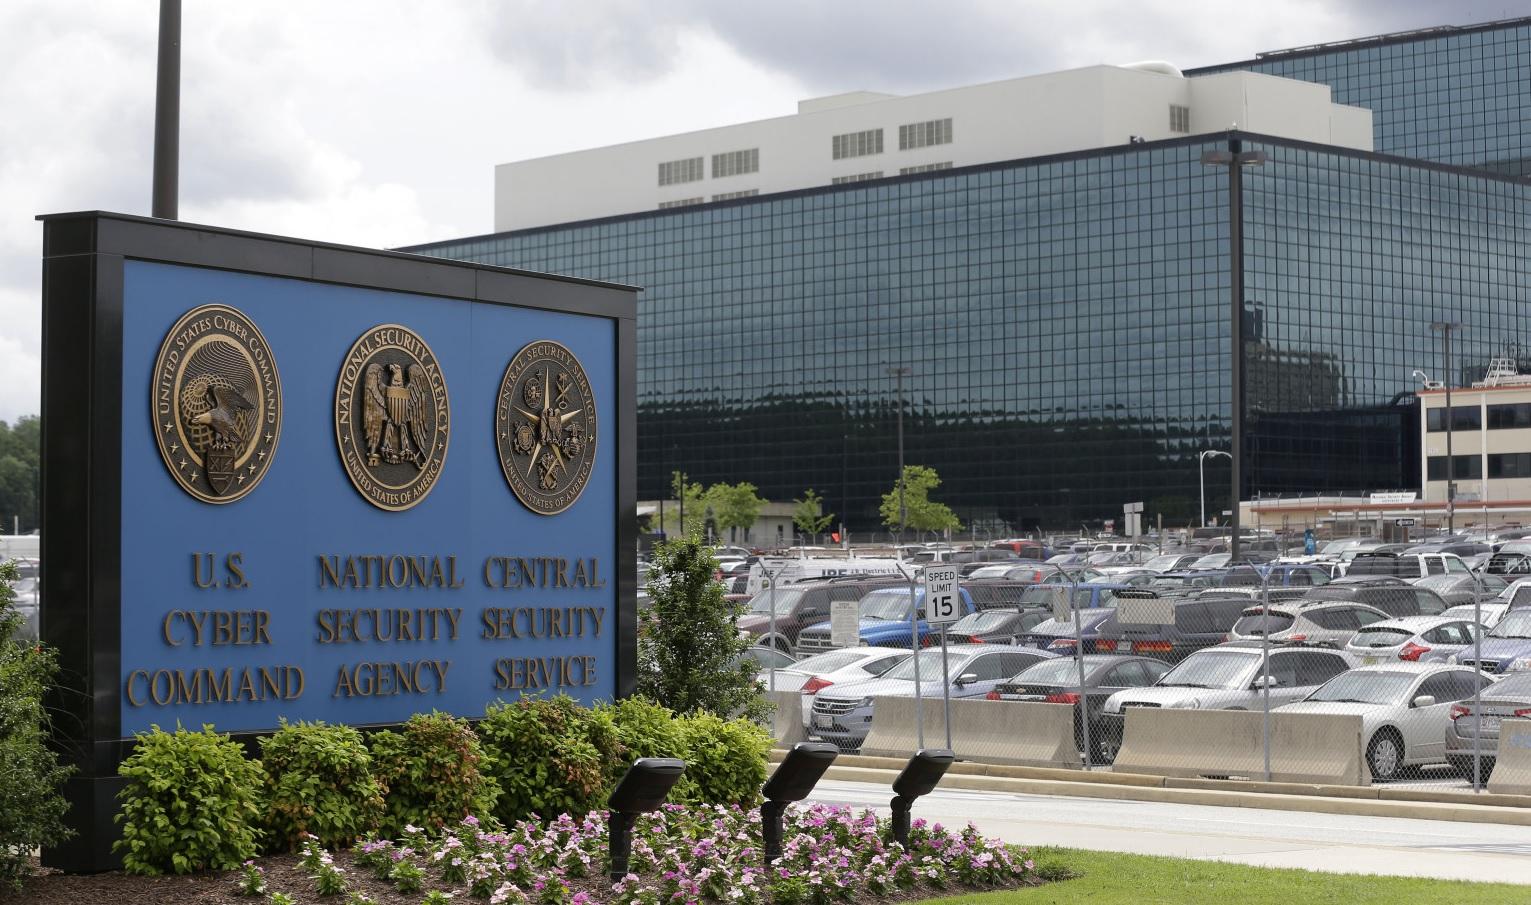 Juez de EE.UU considera legal espionaje de datos telefónicos por NSA